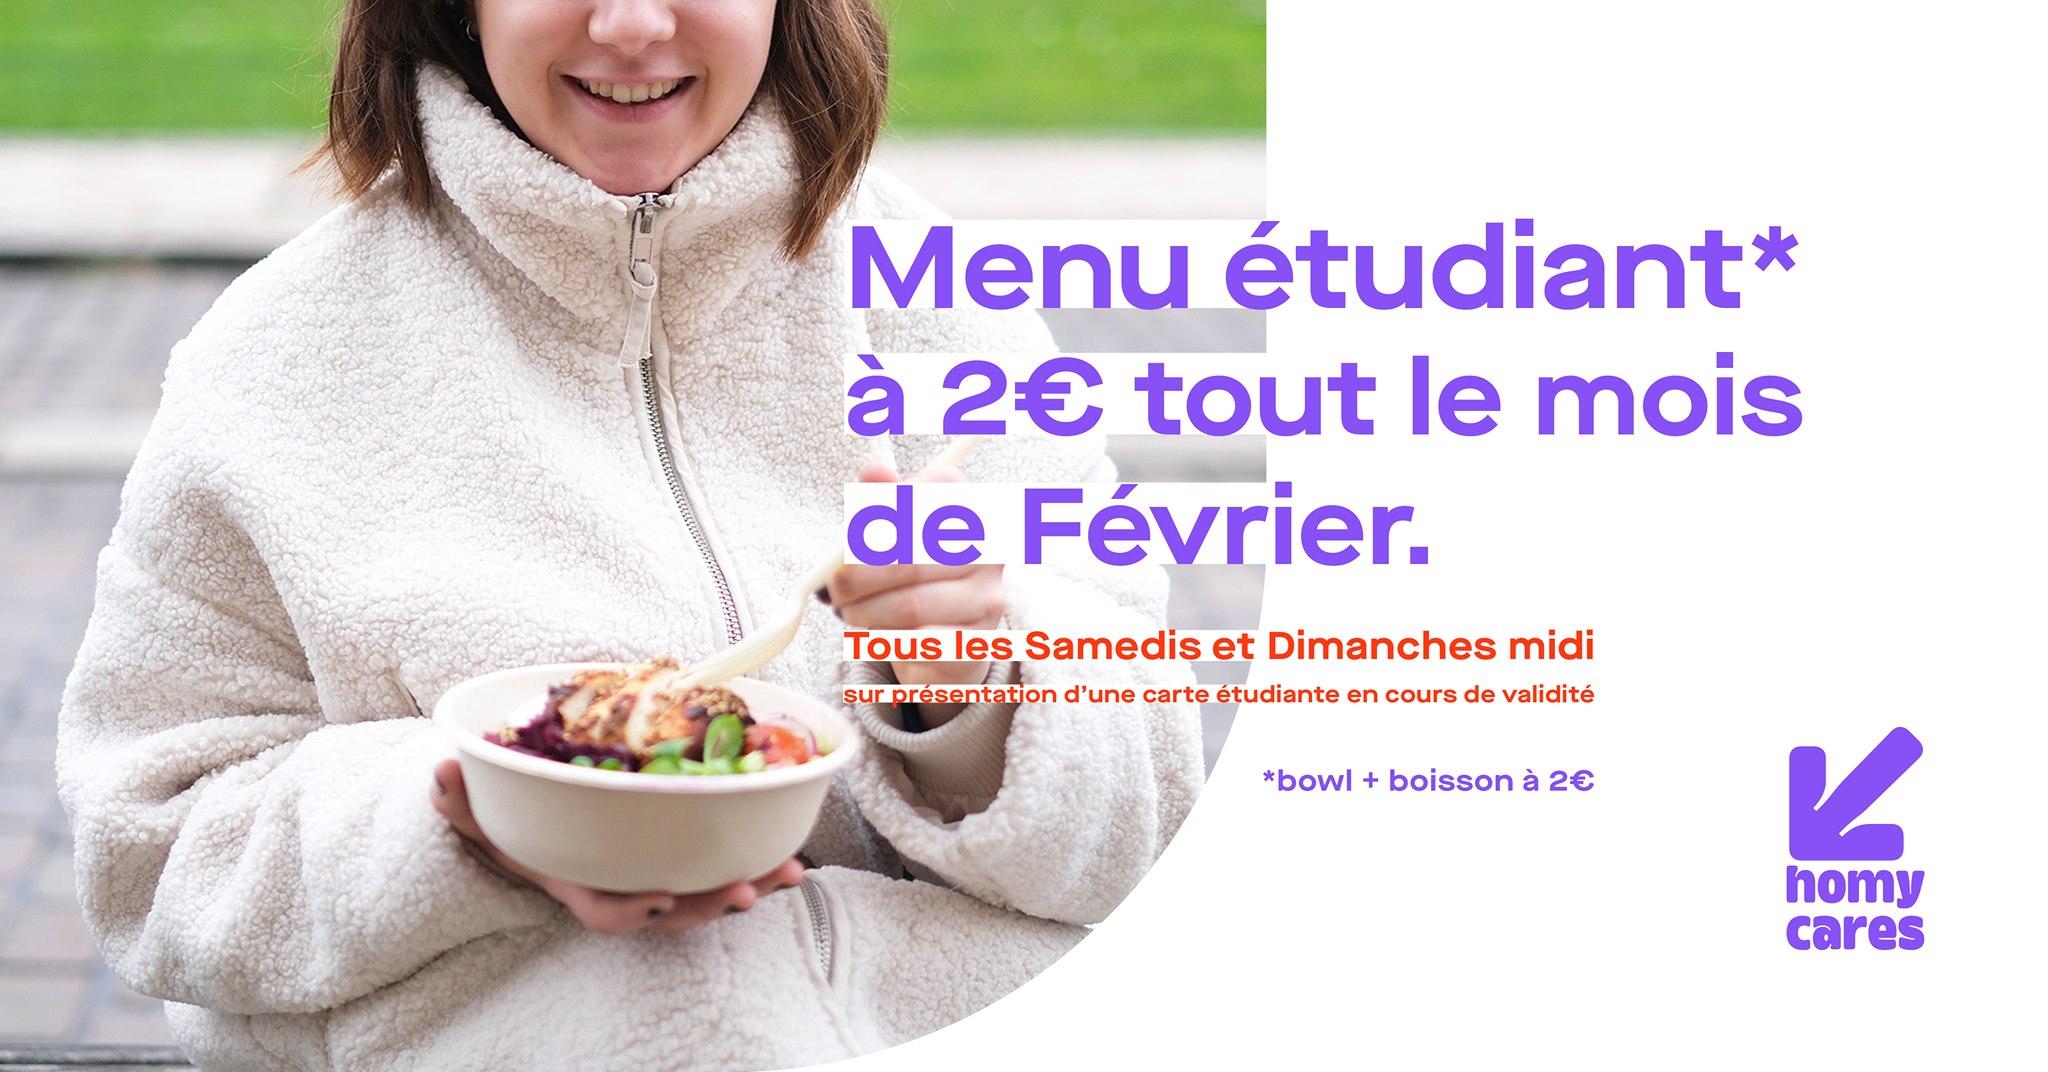 [Etudiants] Menu Bowl + boisson à 2€ - Pokemoon Talence & Bordeaux / Paula (33)